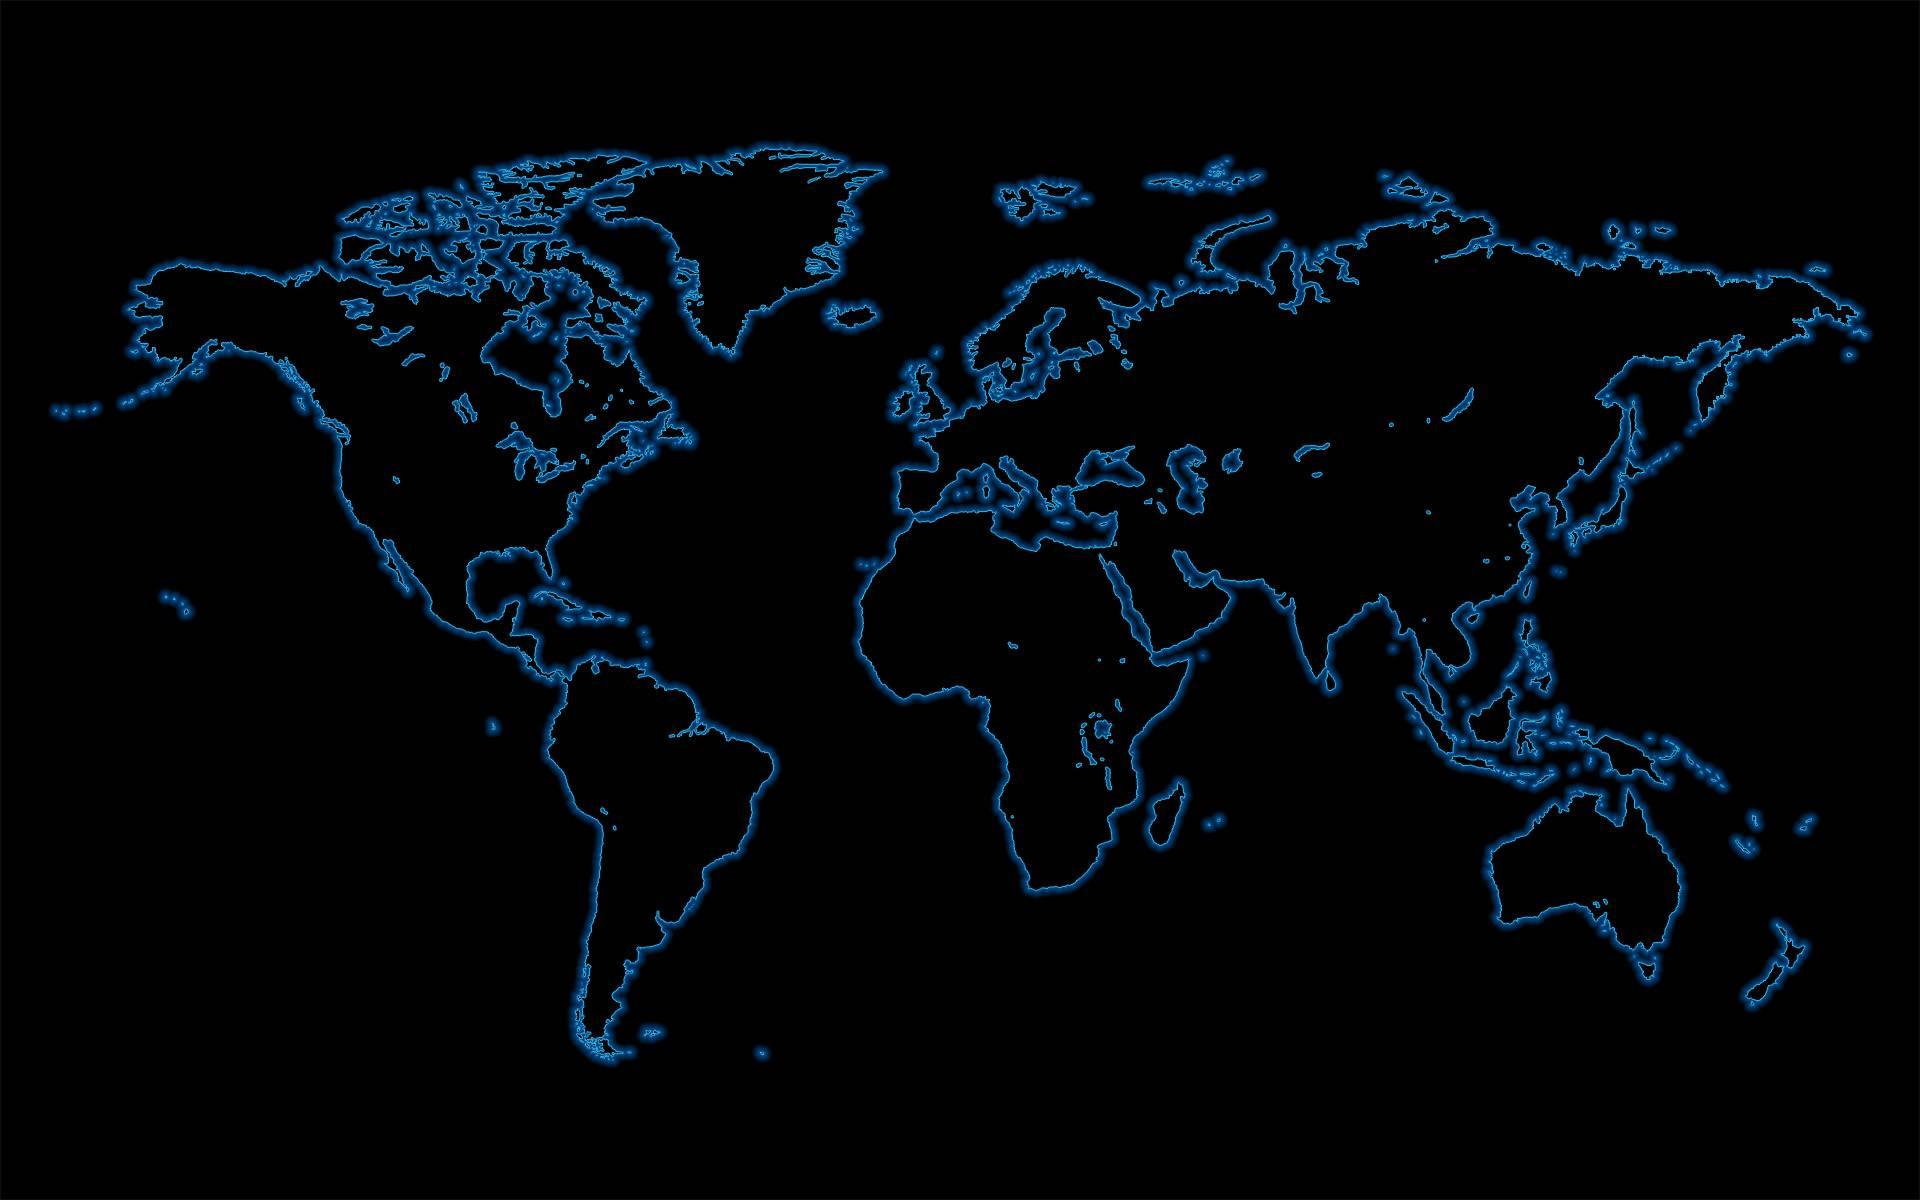 Black World Map Wallpaper 8643 Hd Wallpapers in Travel n World 1920x1200